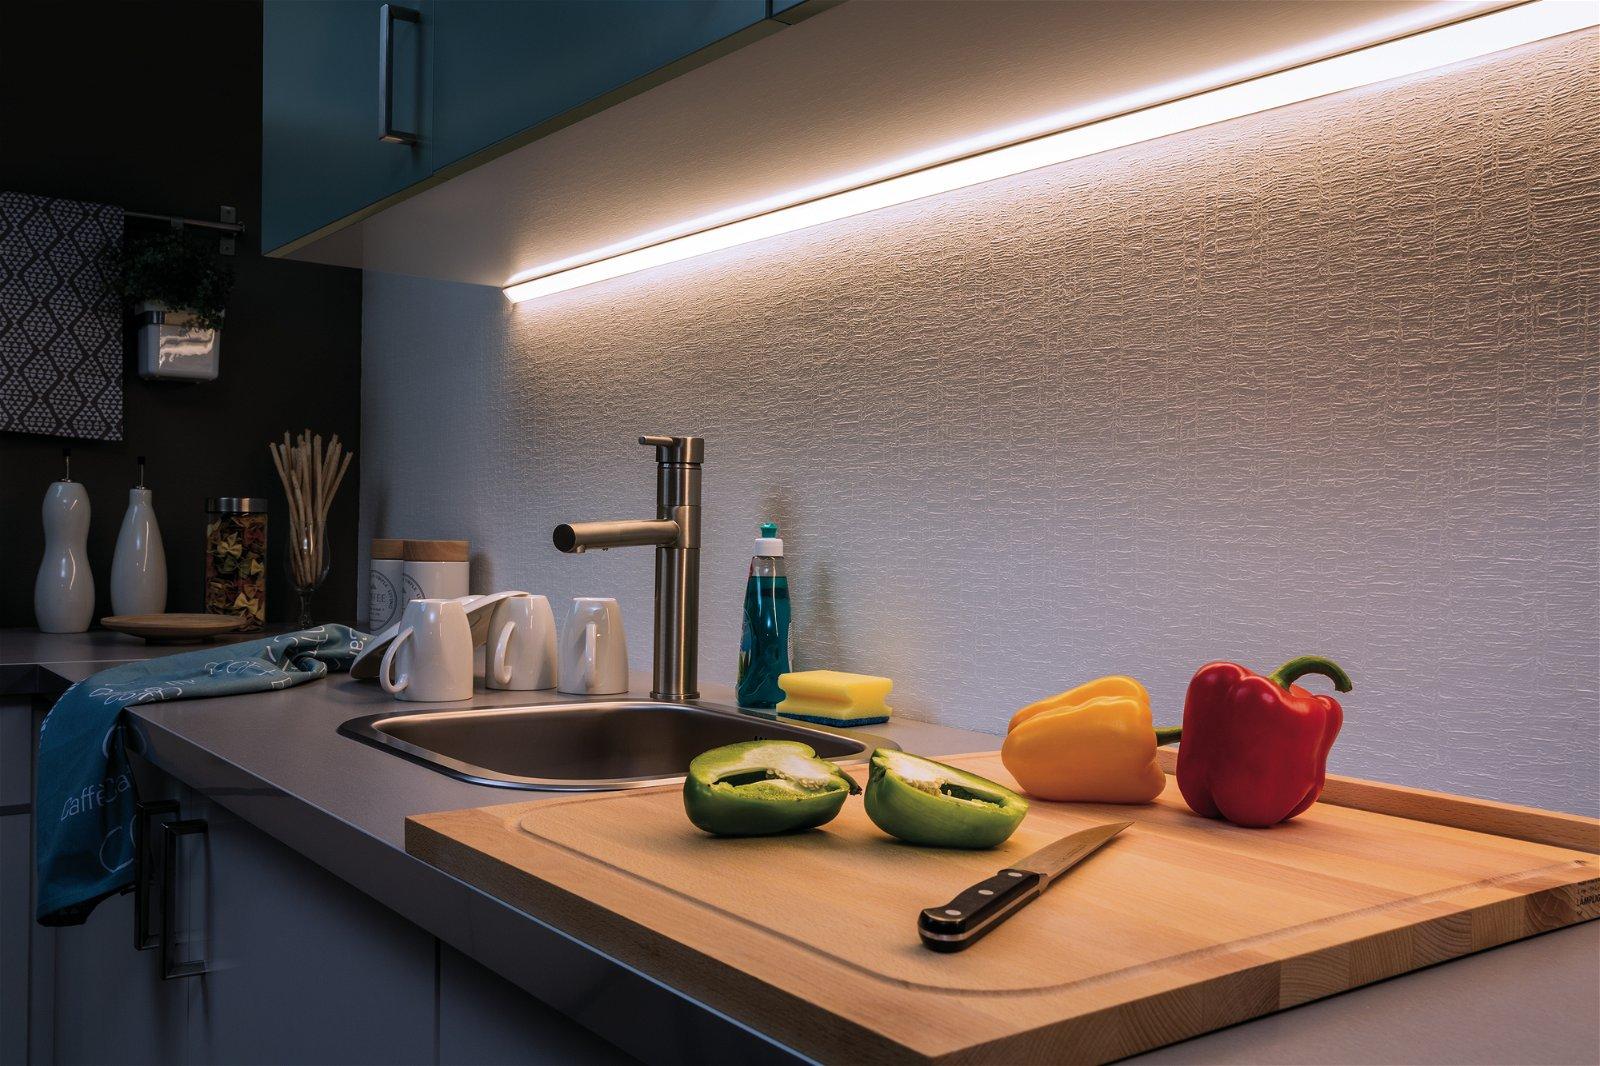 MaxLED 500 LED Strip Tageslichtweiß 0,5m 3W 560lm/m 6500K